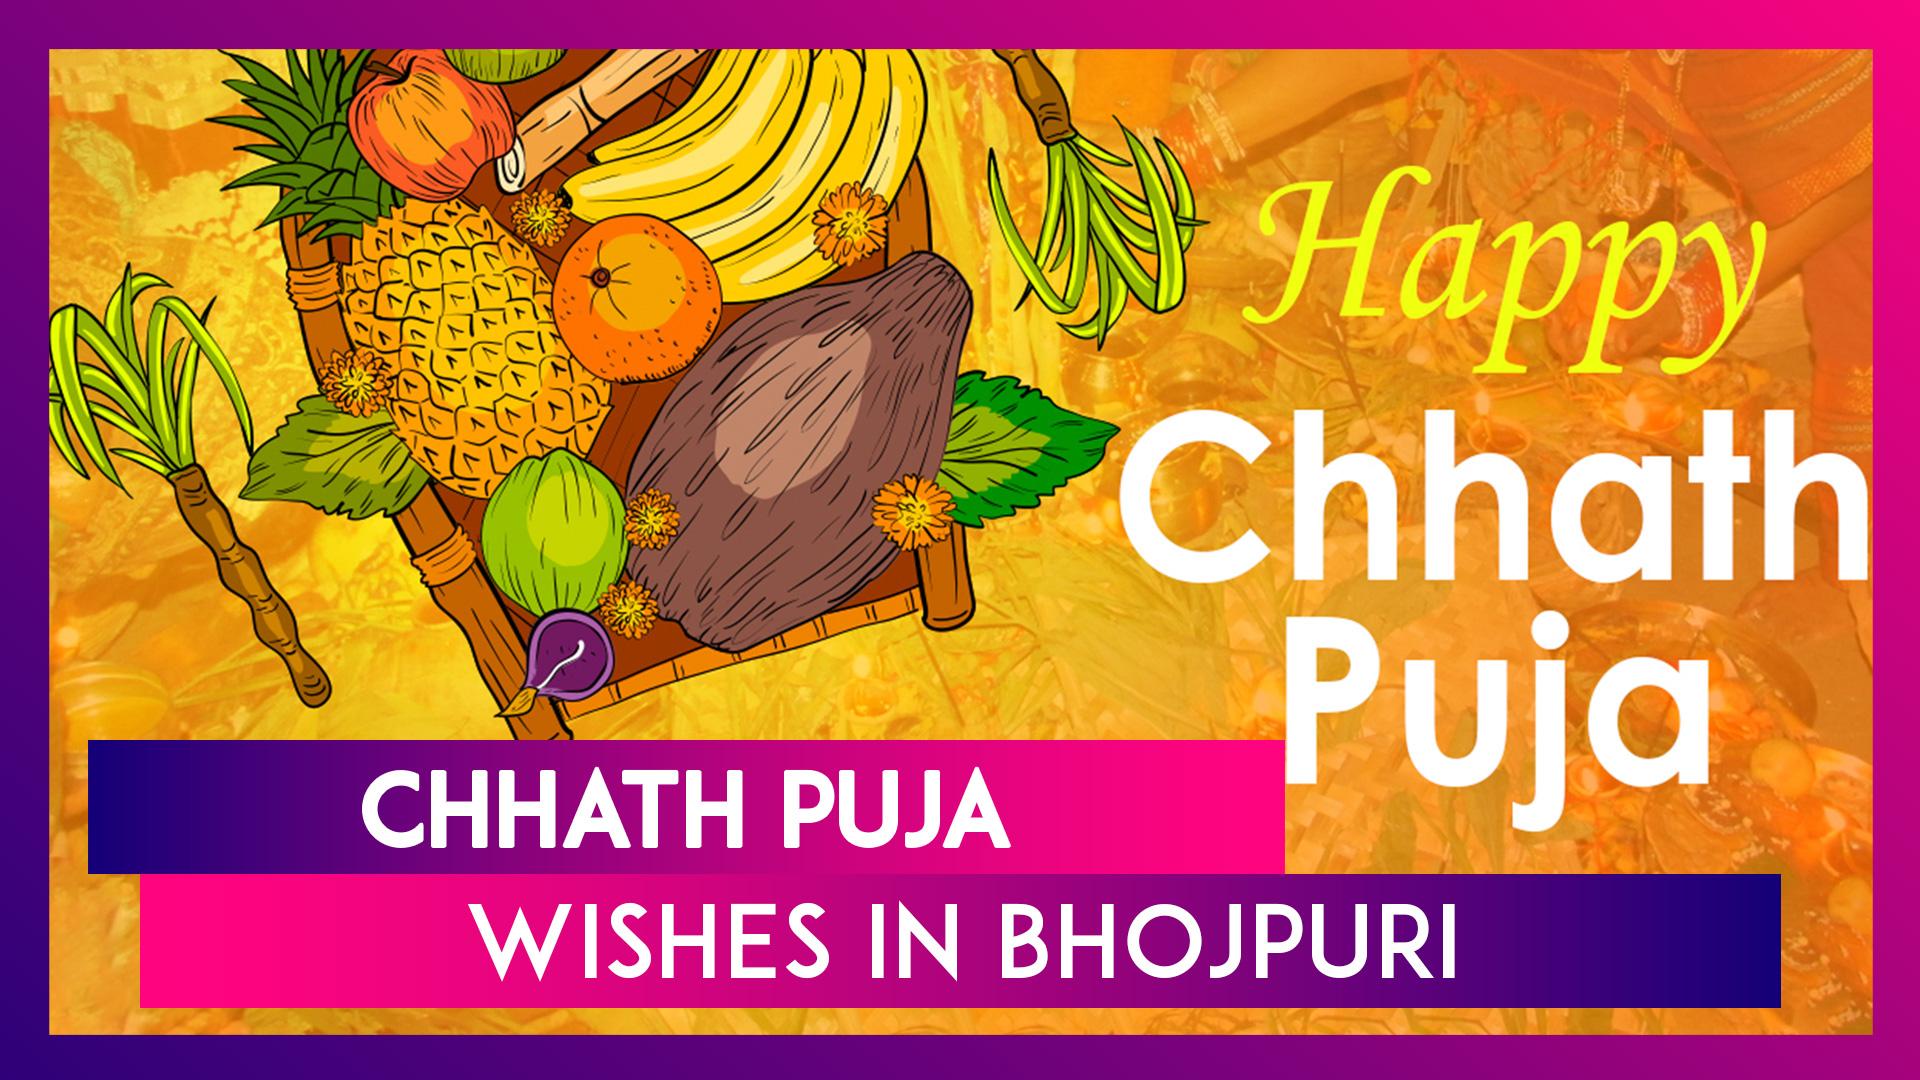 Happy Chhath Puja 2020 Bhojpuri Wishes, Greetings, Chhathi Maiya & Sun God Pics To Celebrate The Day